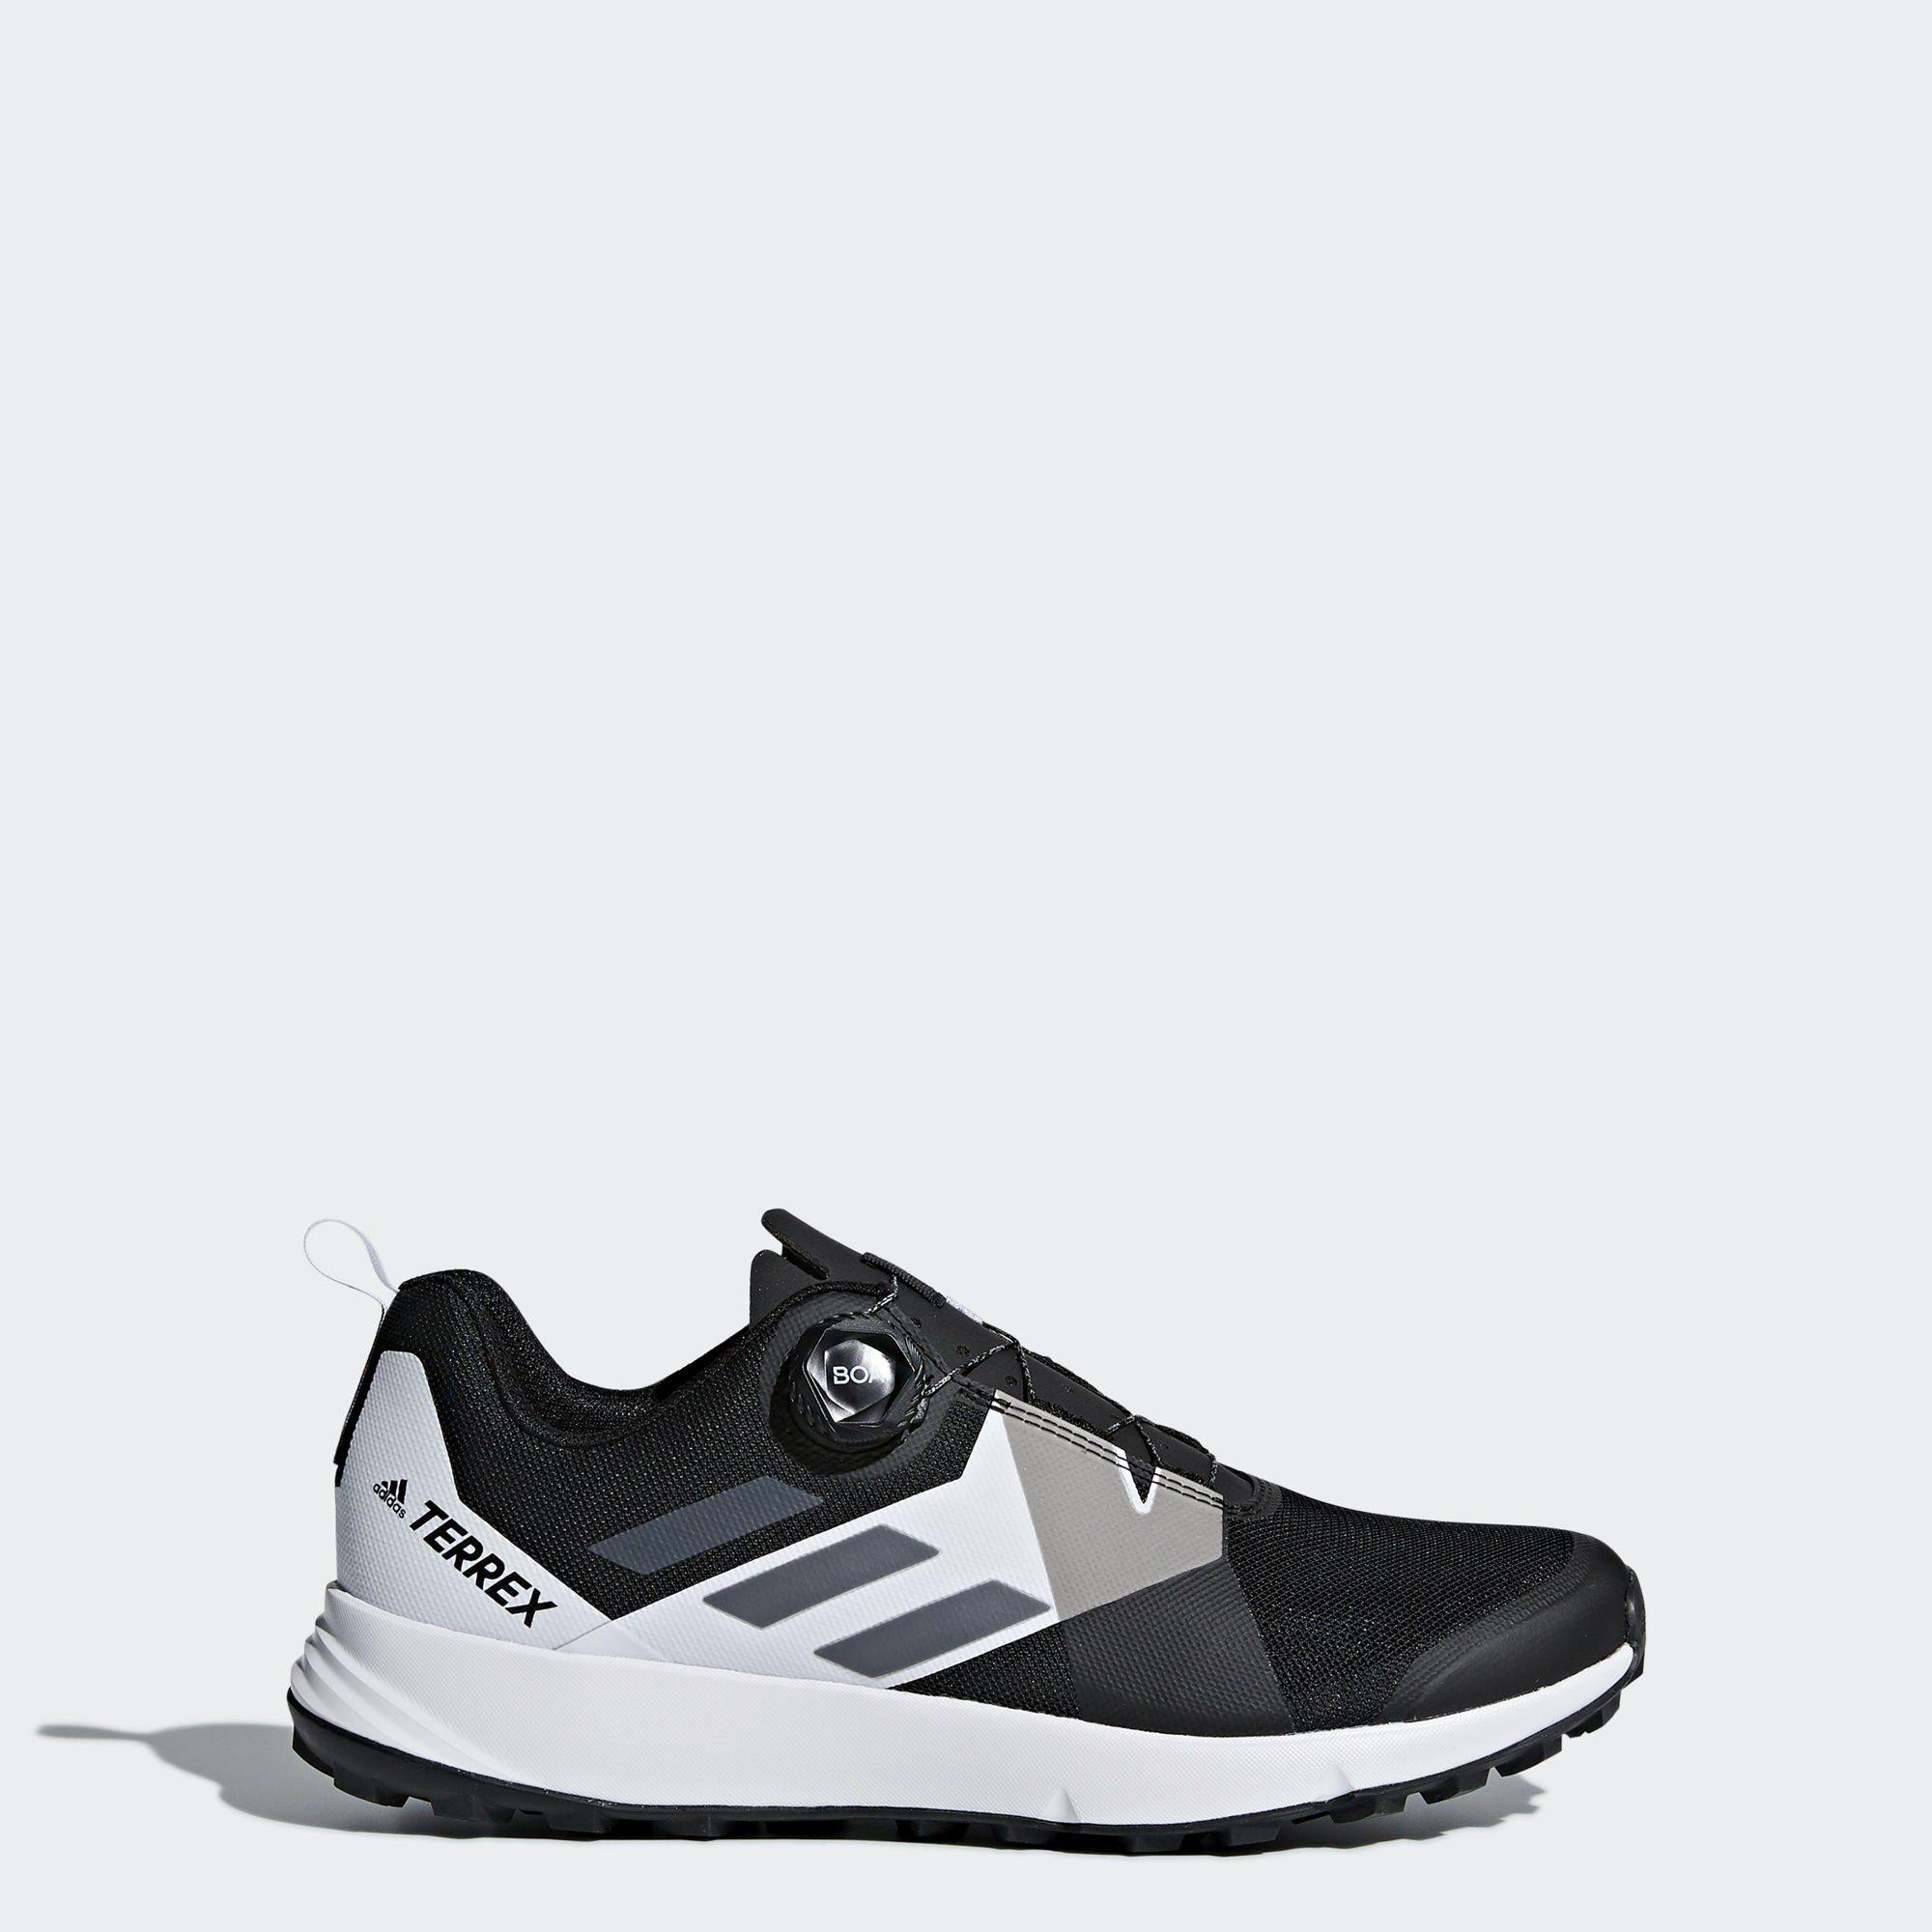 adidas Performance TERREX Two Boa Outdoorschuh  black